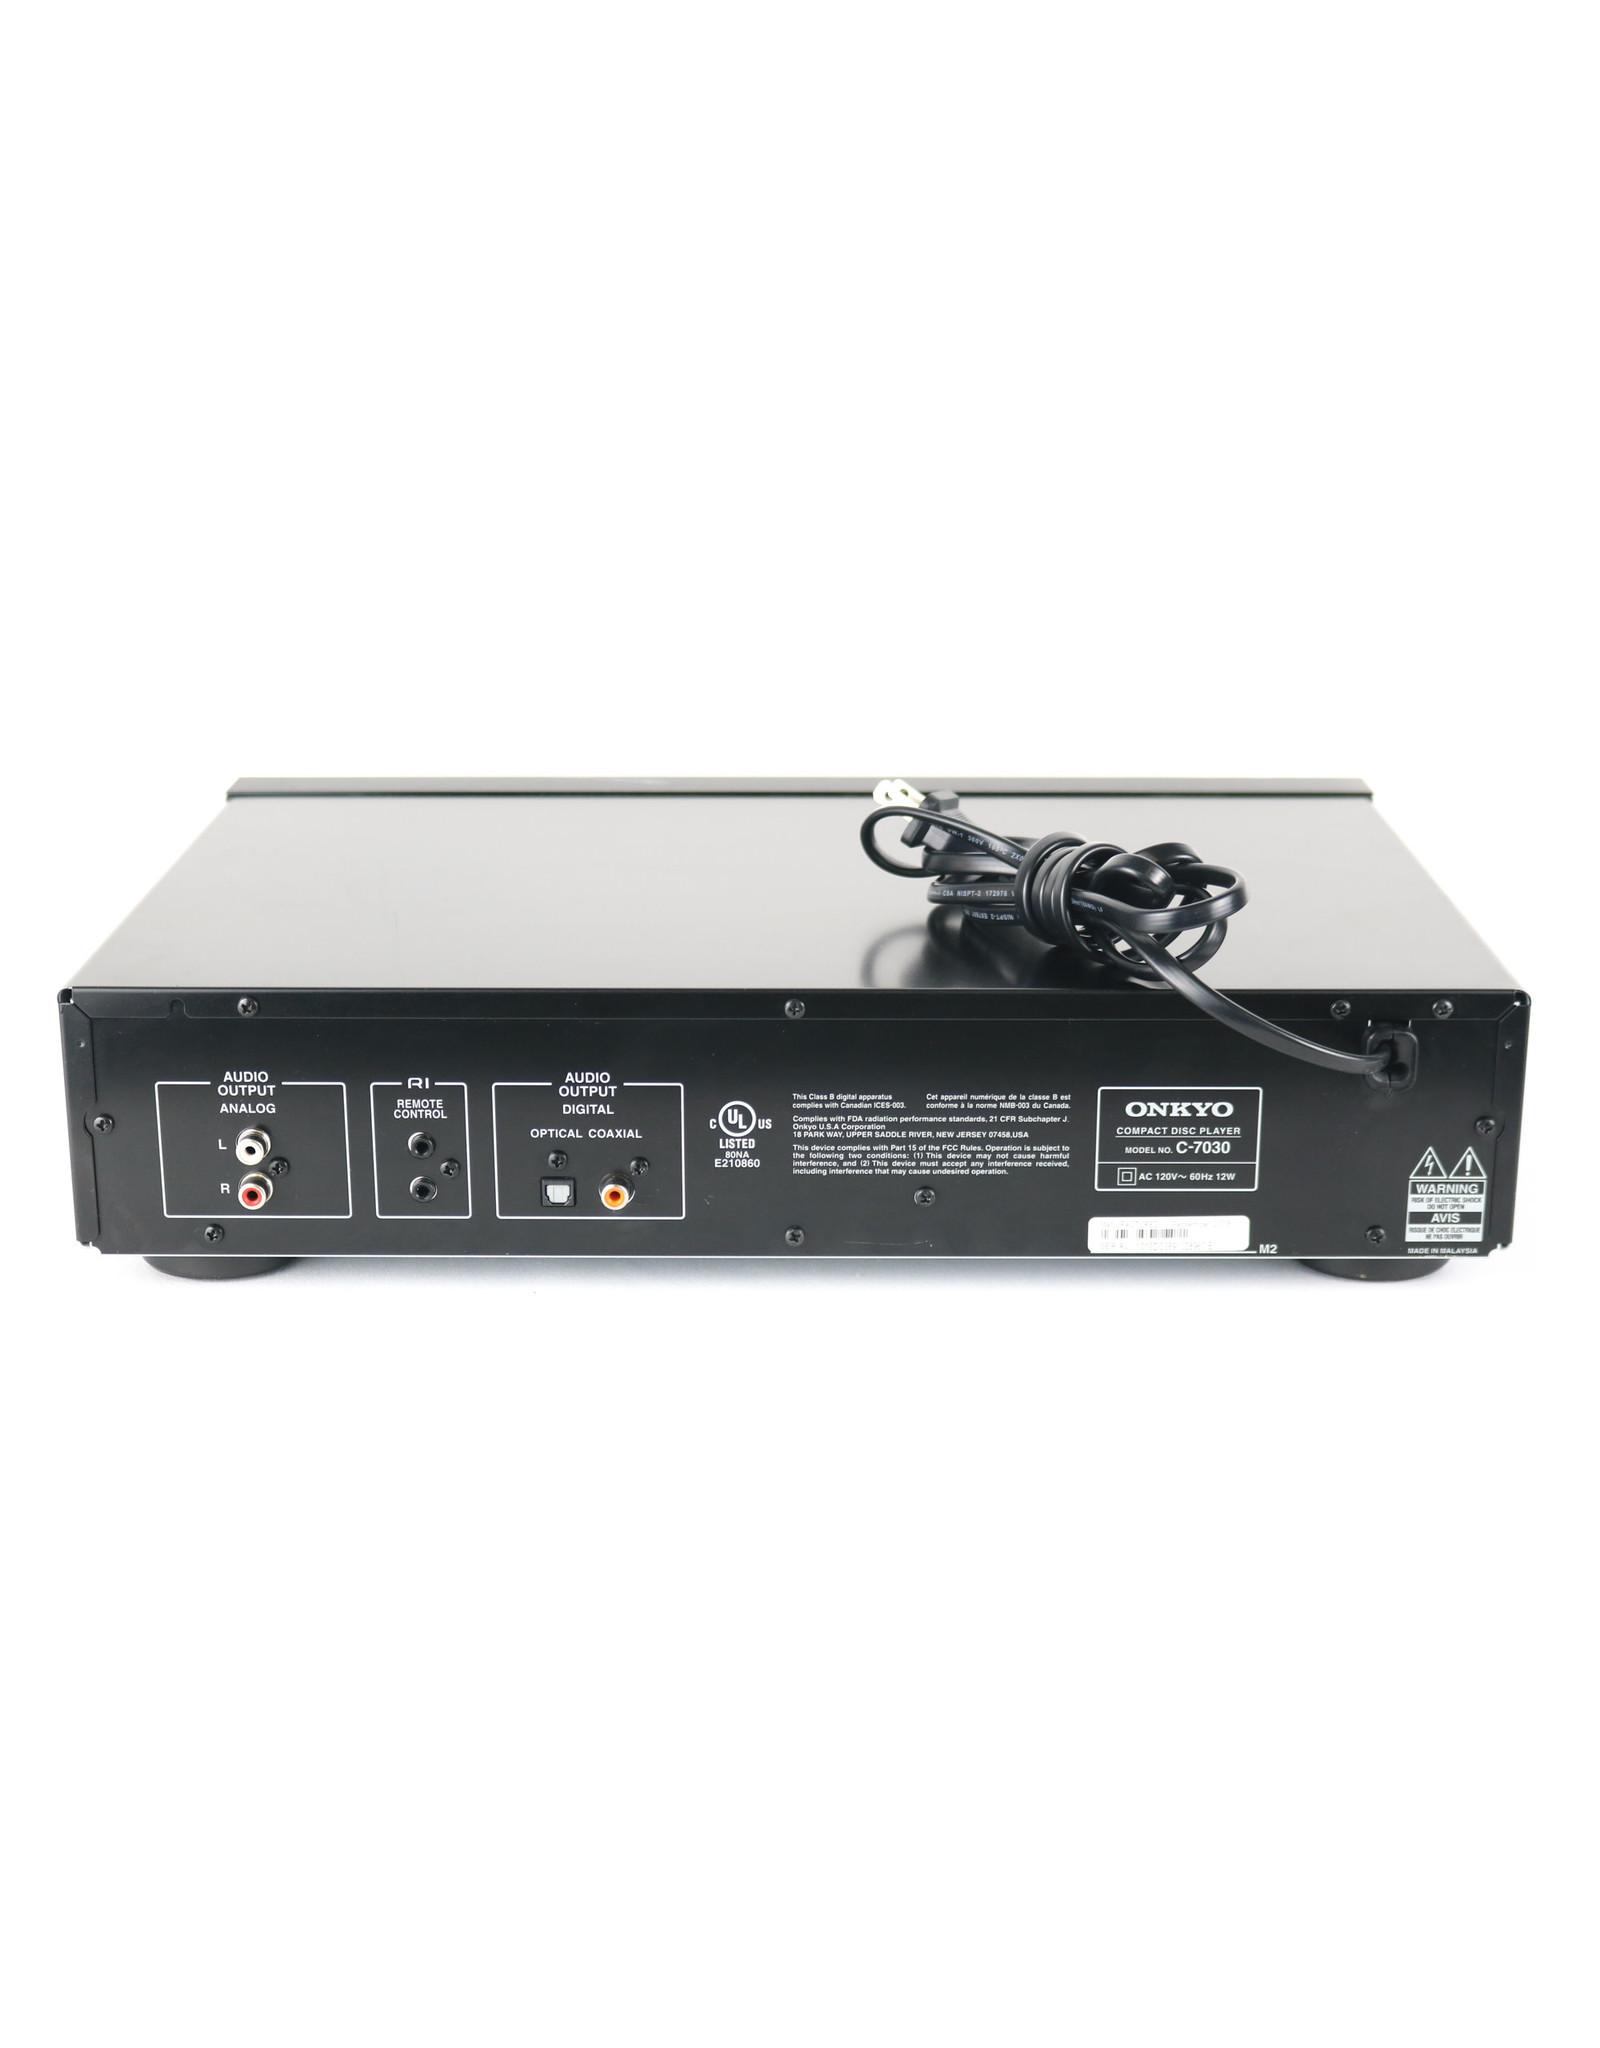 Onkyo Onkyo C-7030 CD Player USED